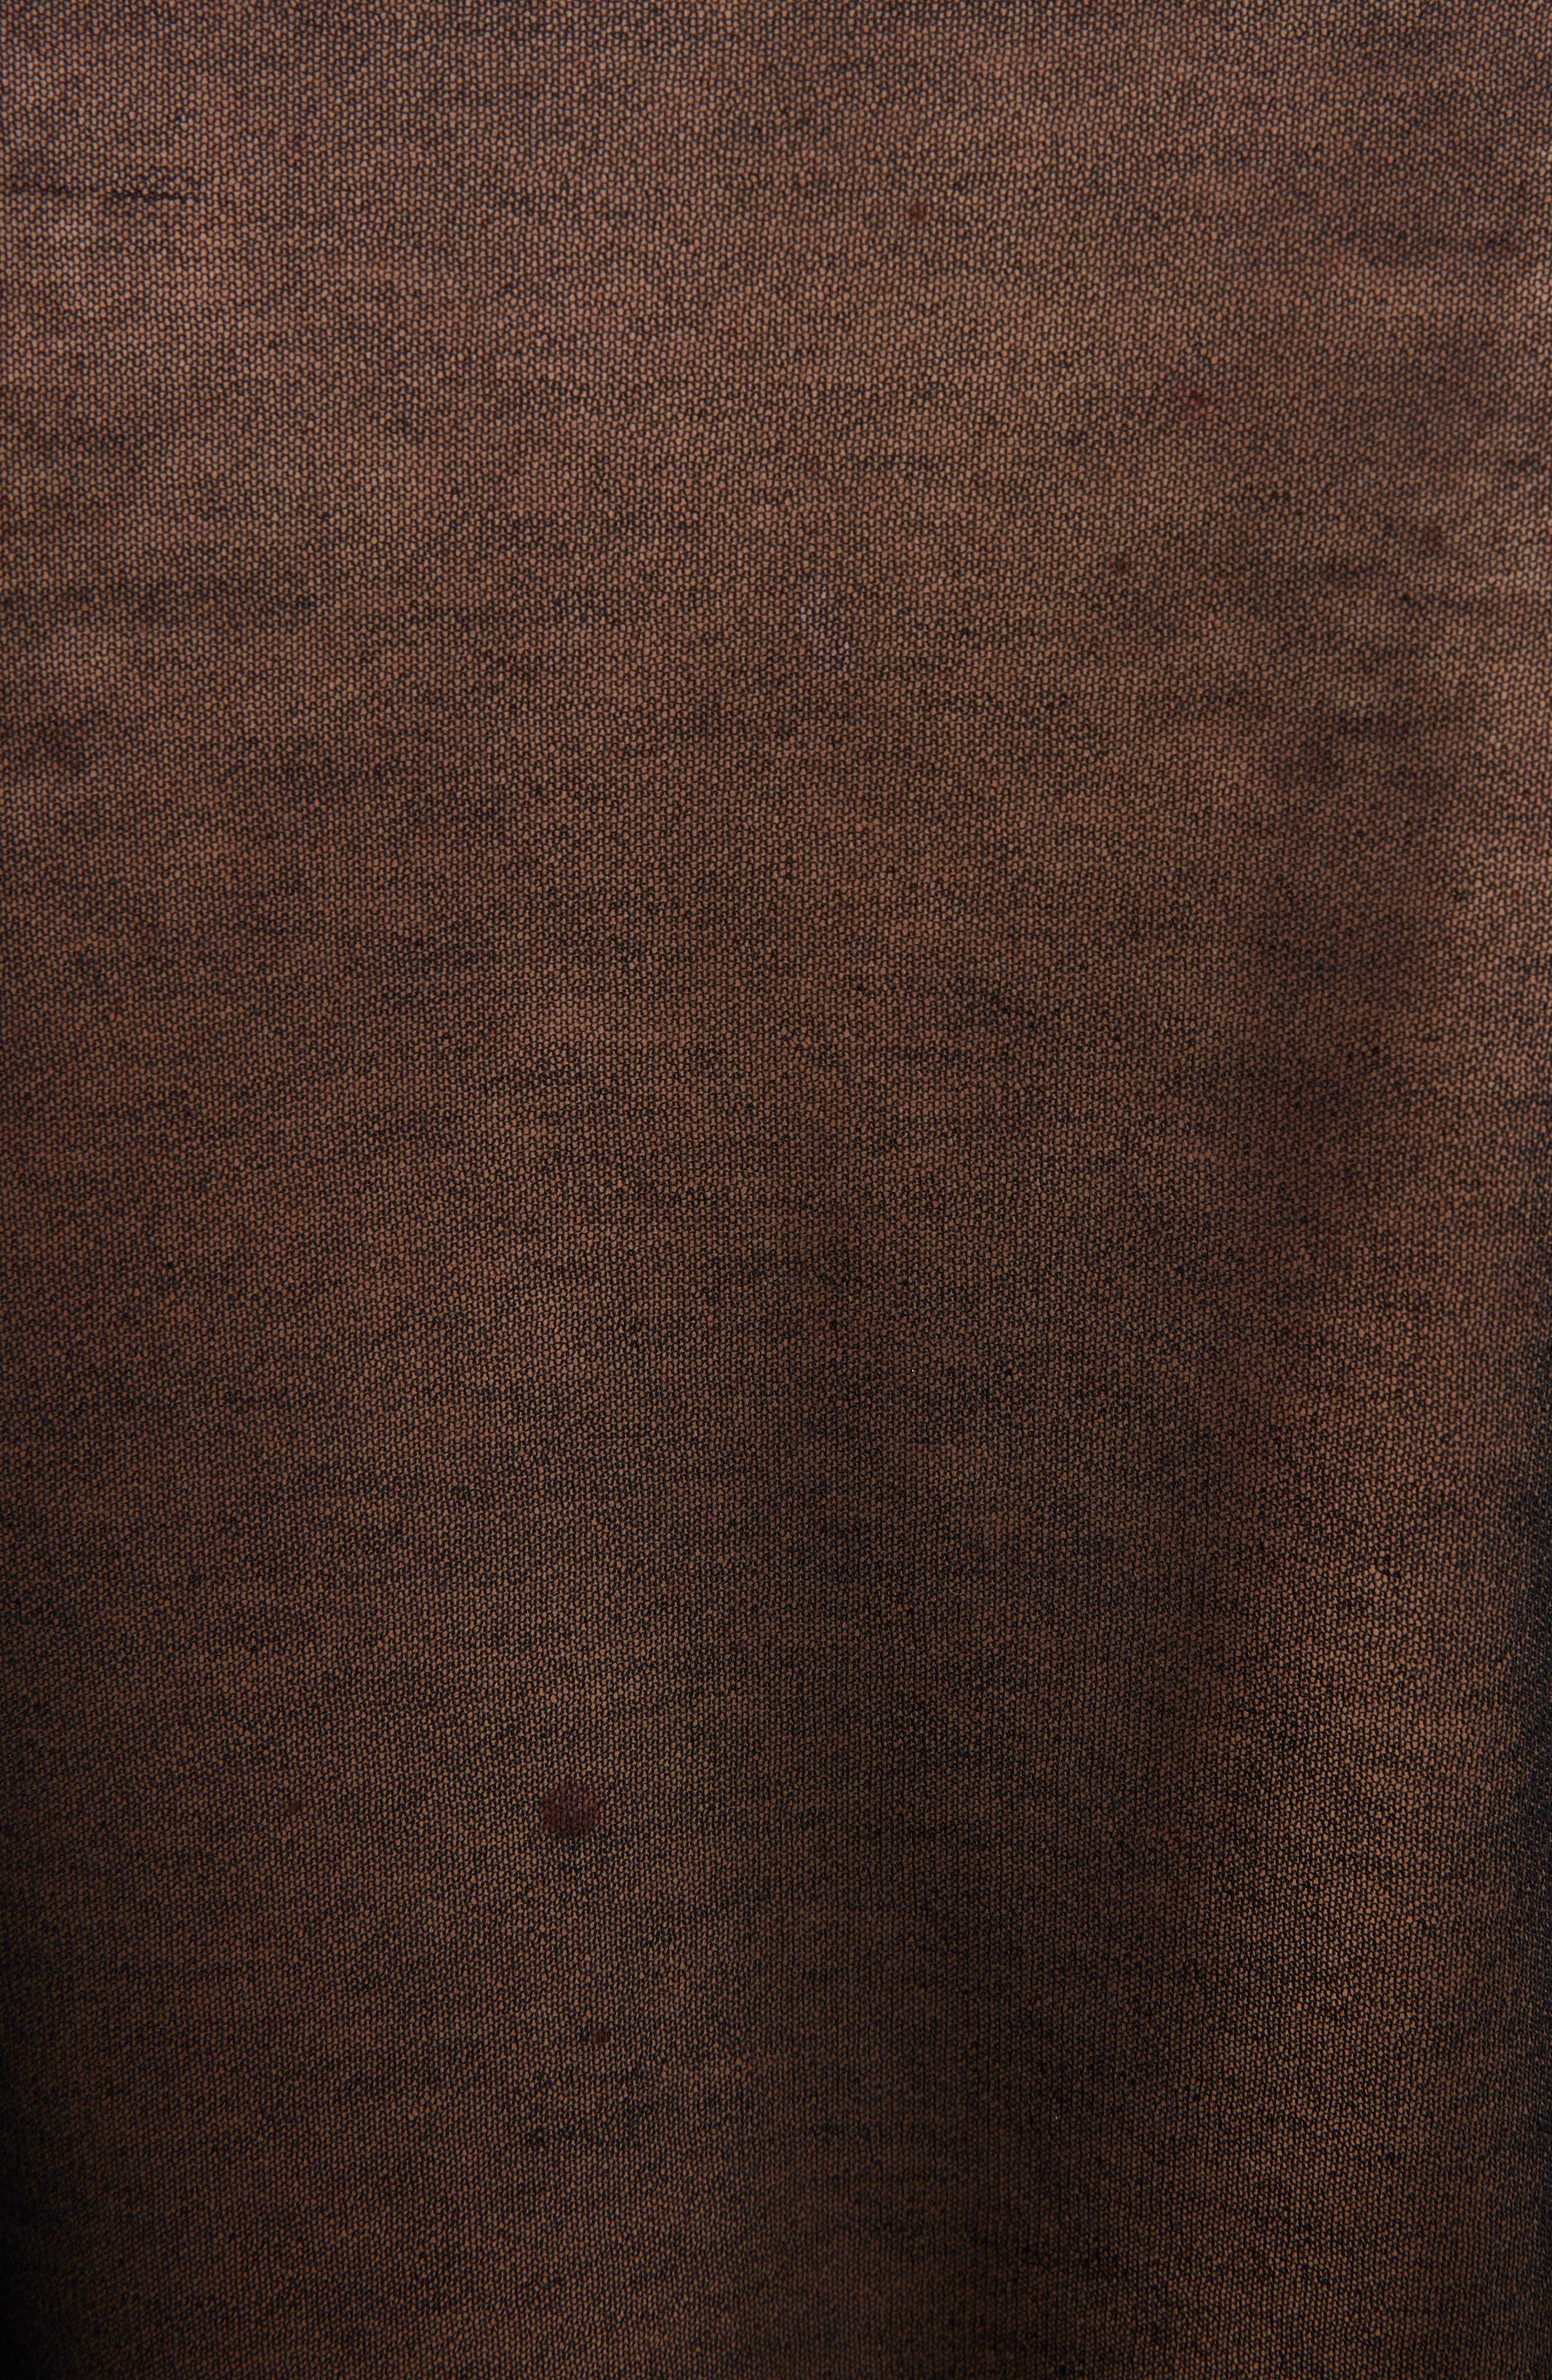 Sheer Cotton Knit Top,                             Alternate thumbnail 5, color,                             Black